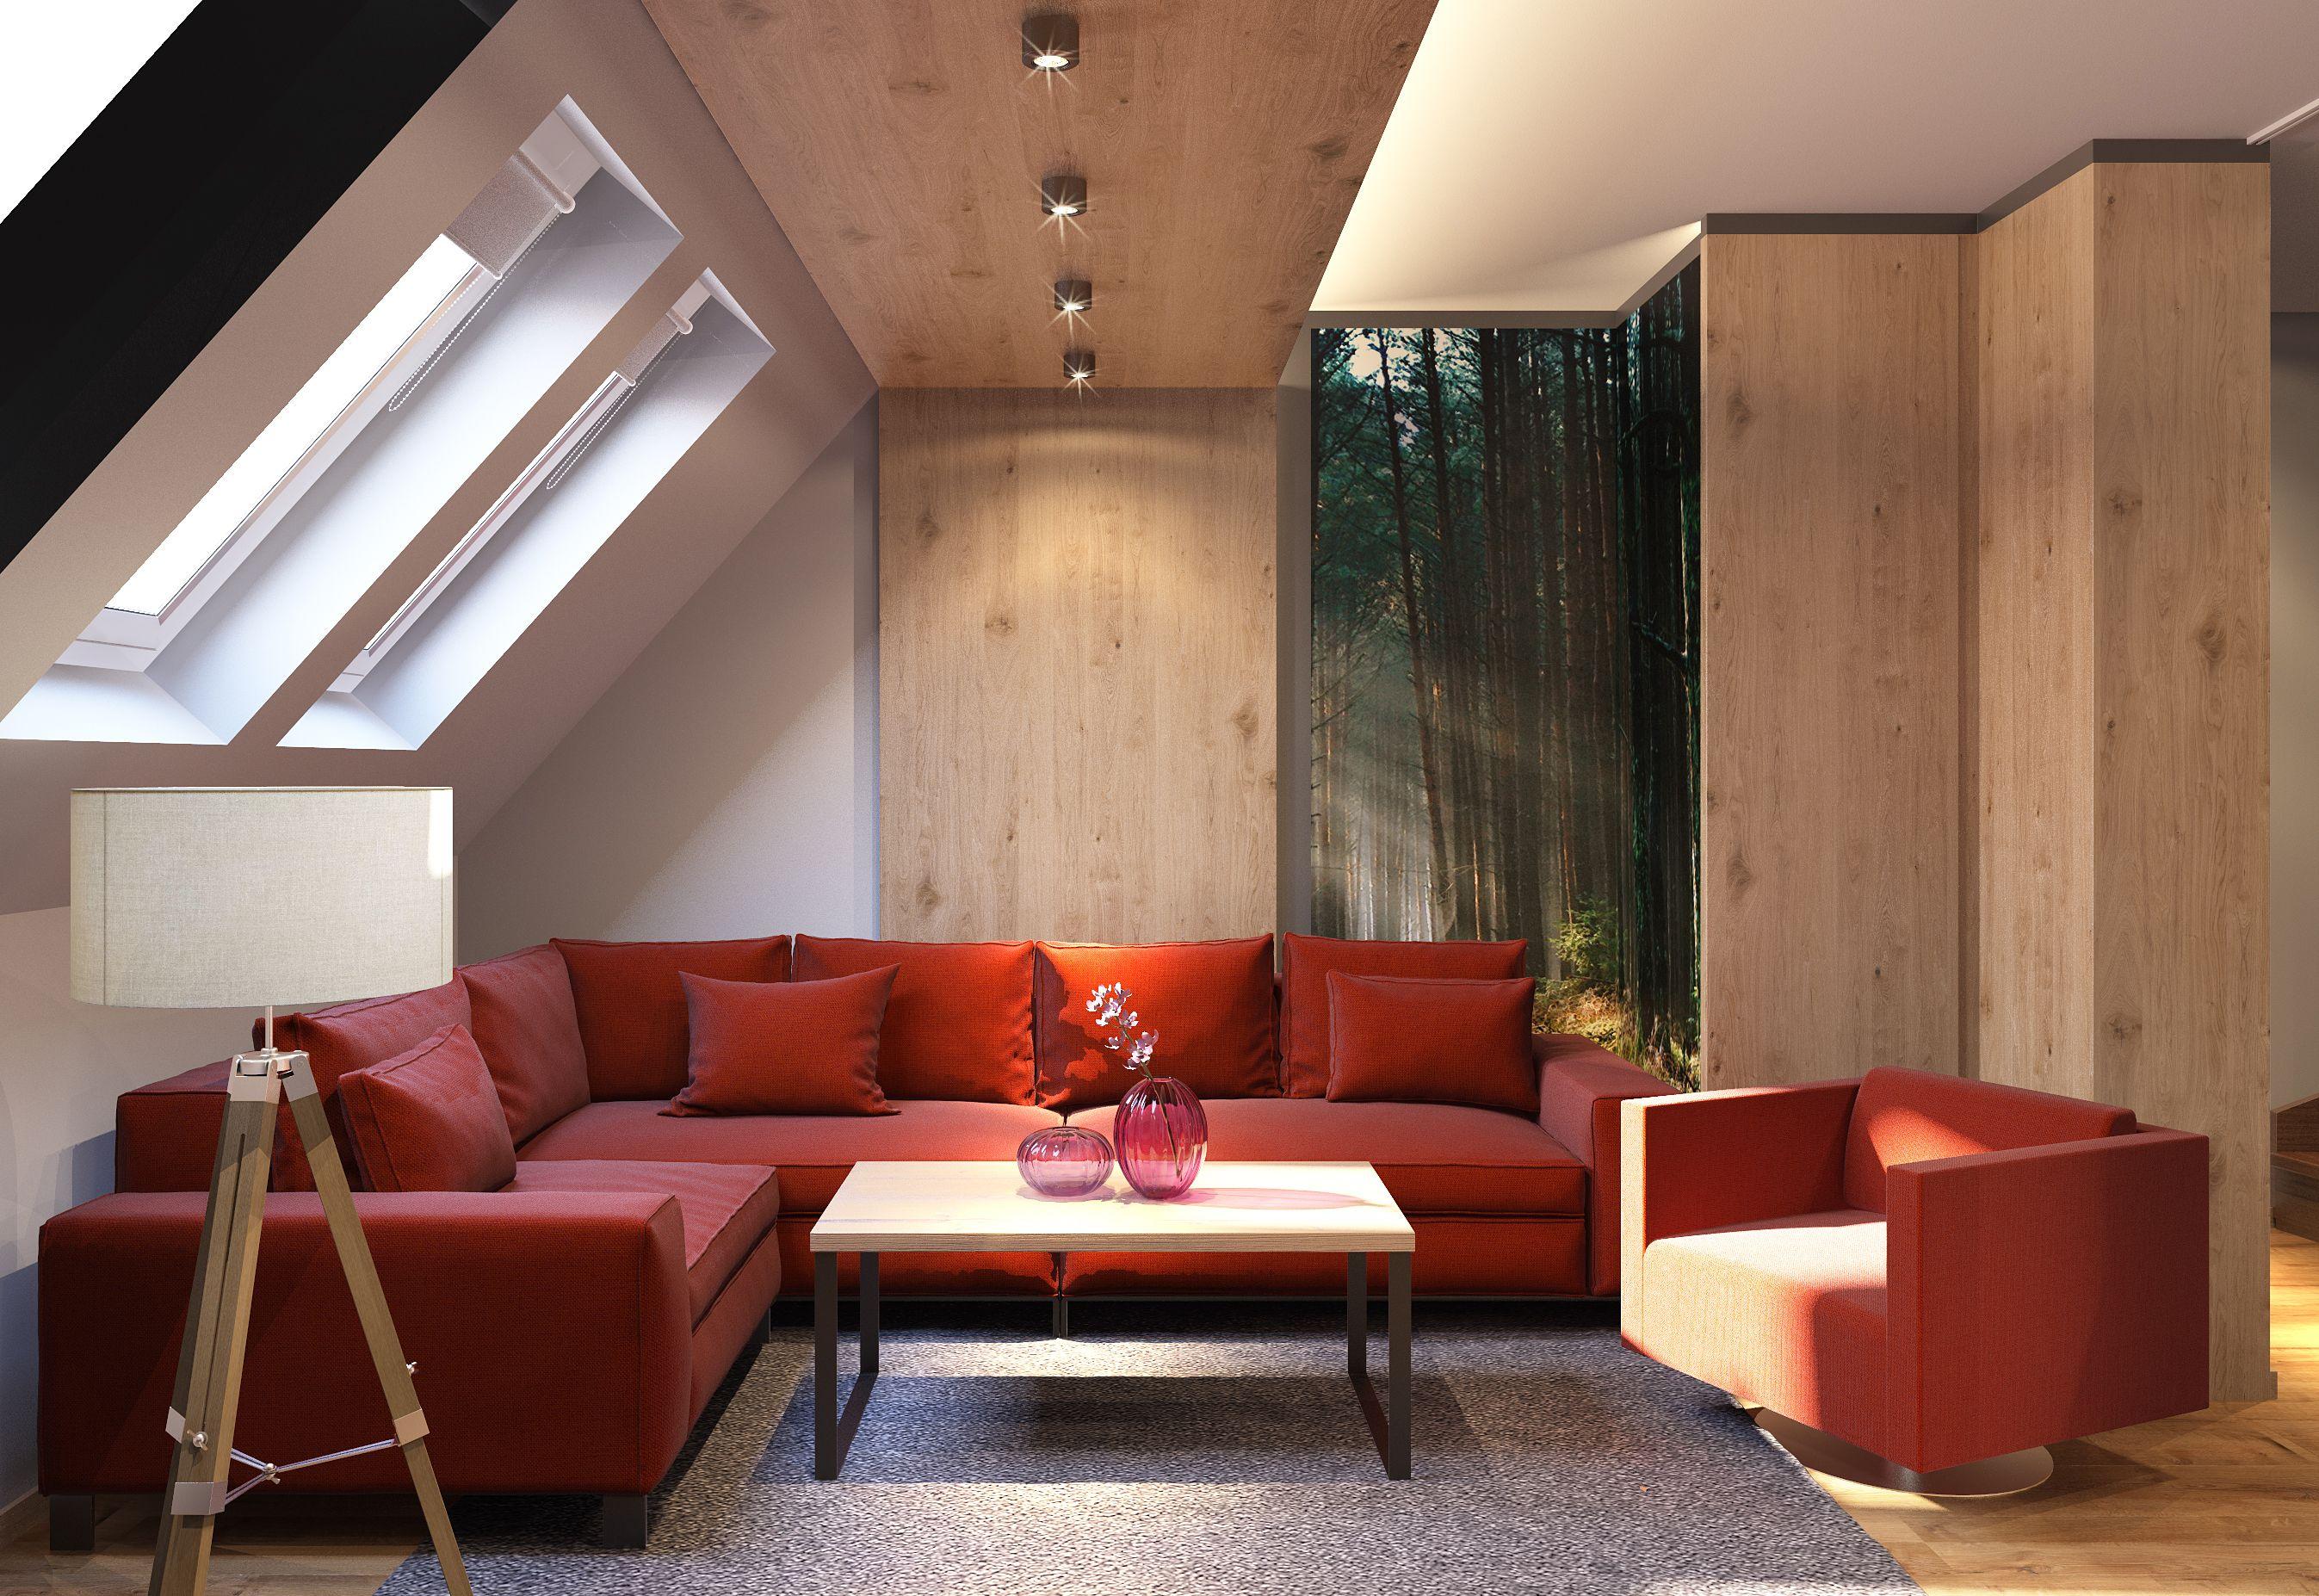 dizajn bytu interier horsky styl (6)